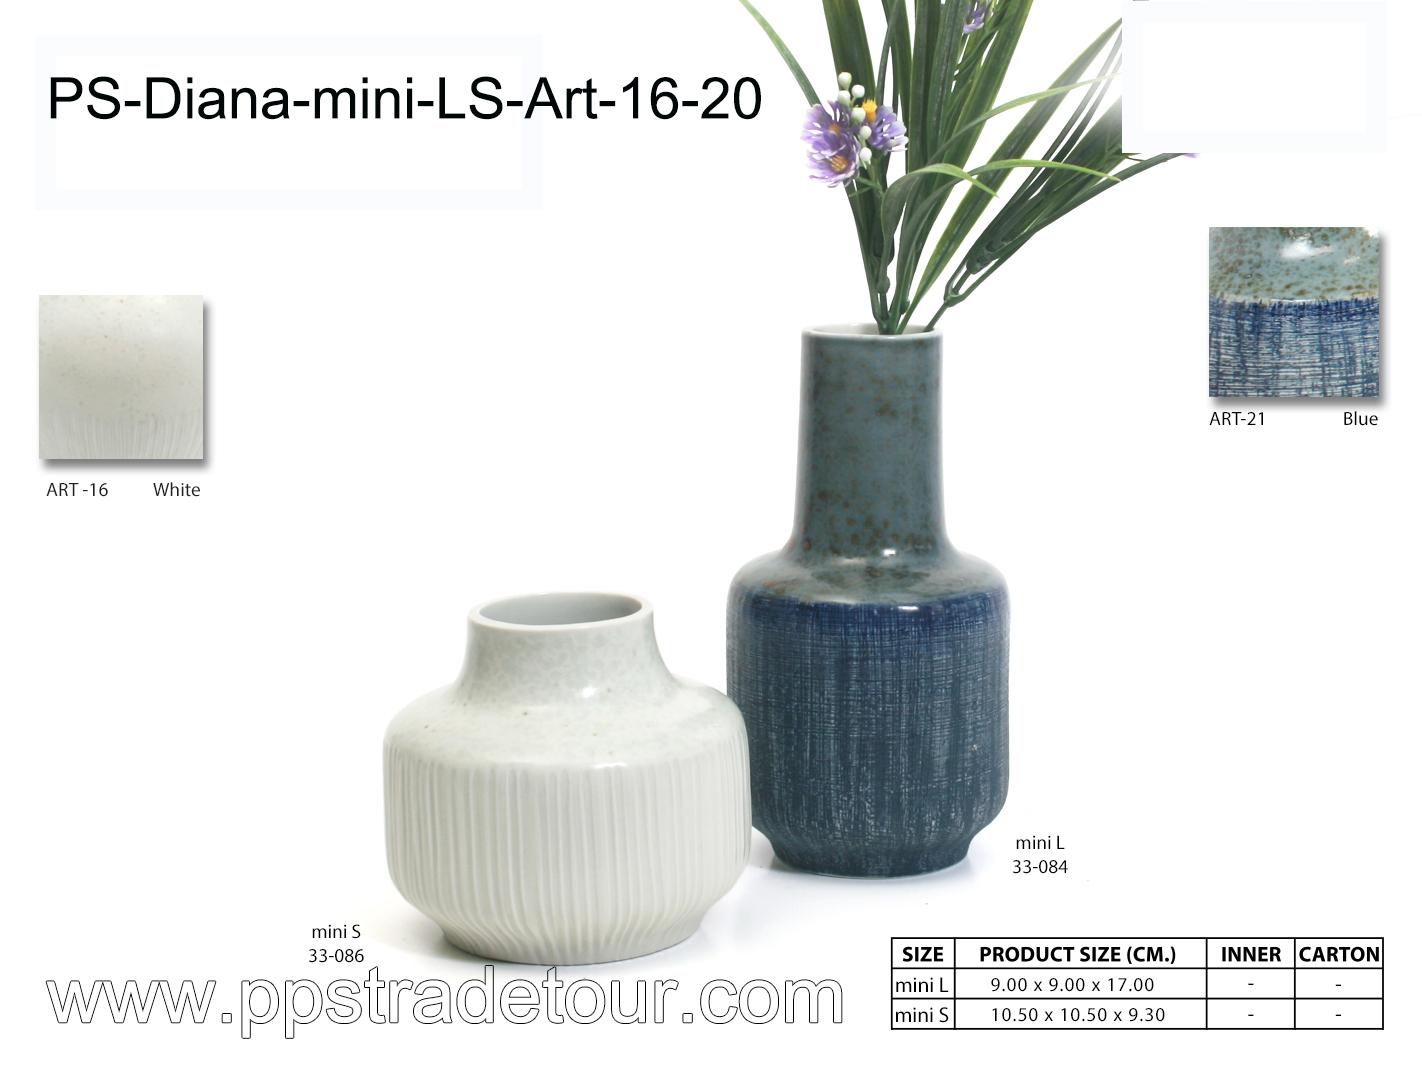 PSCV-Diana-mini-LS-ART-16-20